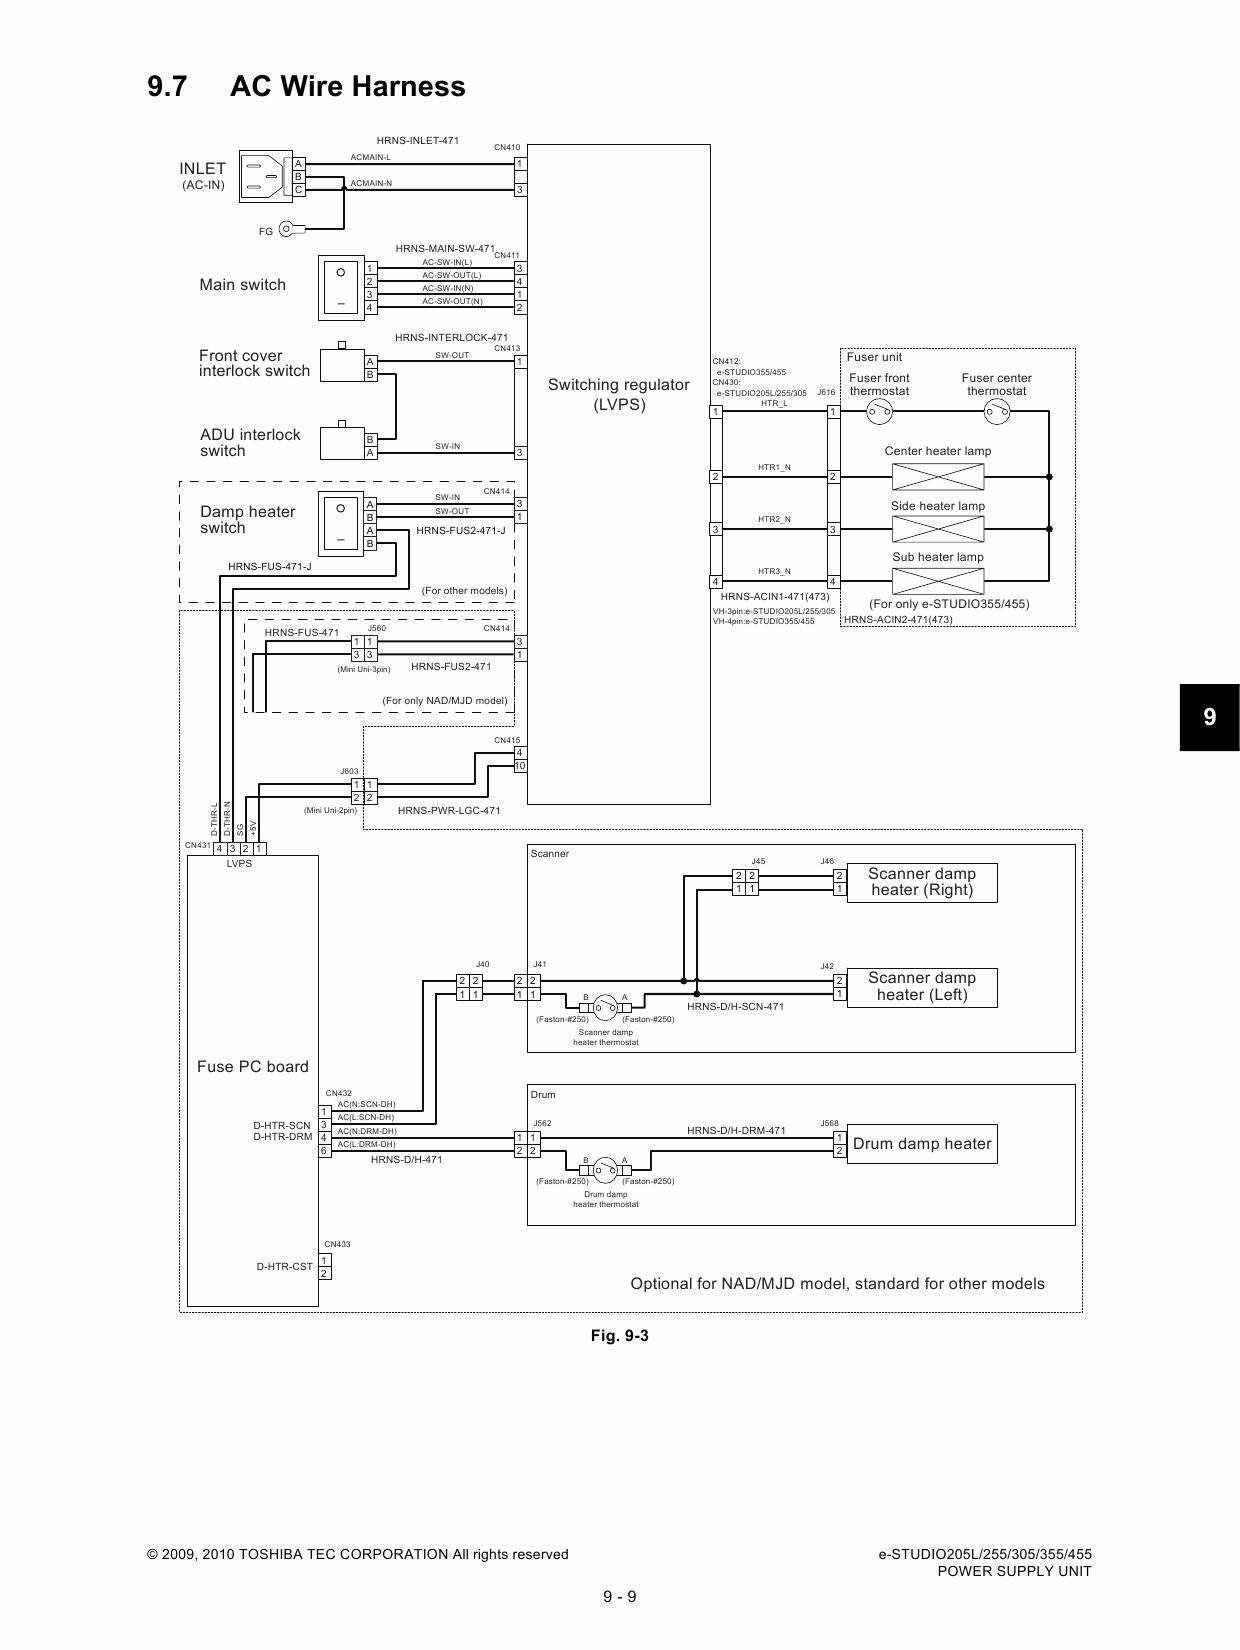 toshiba e studio 255 manual